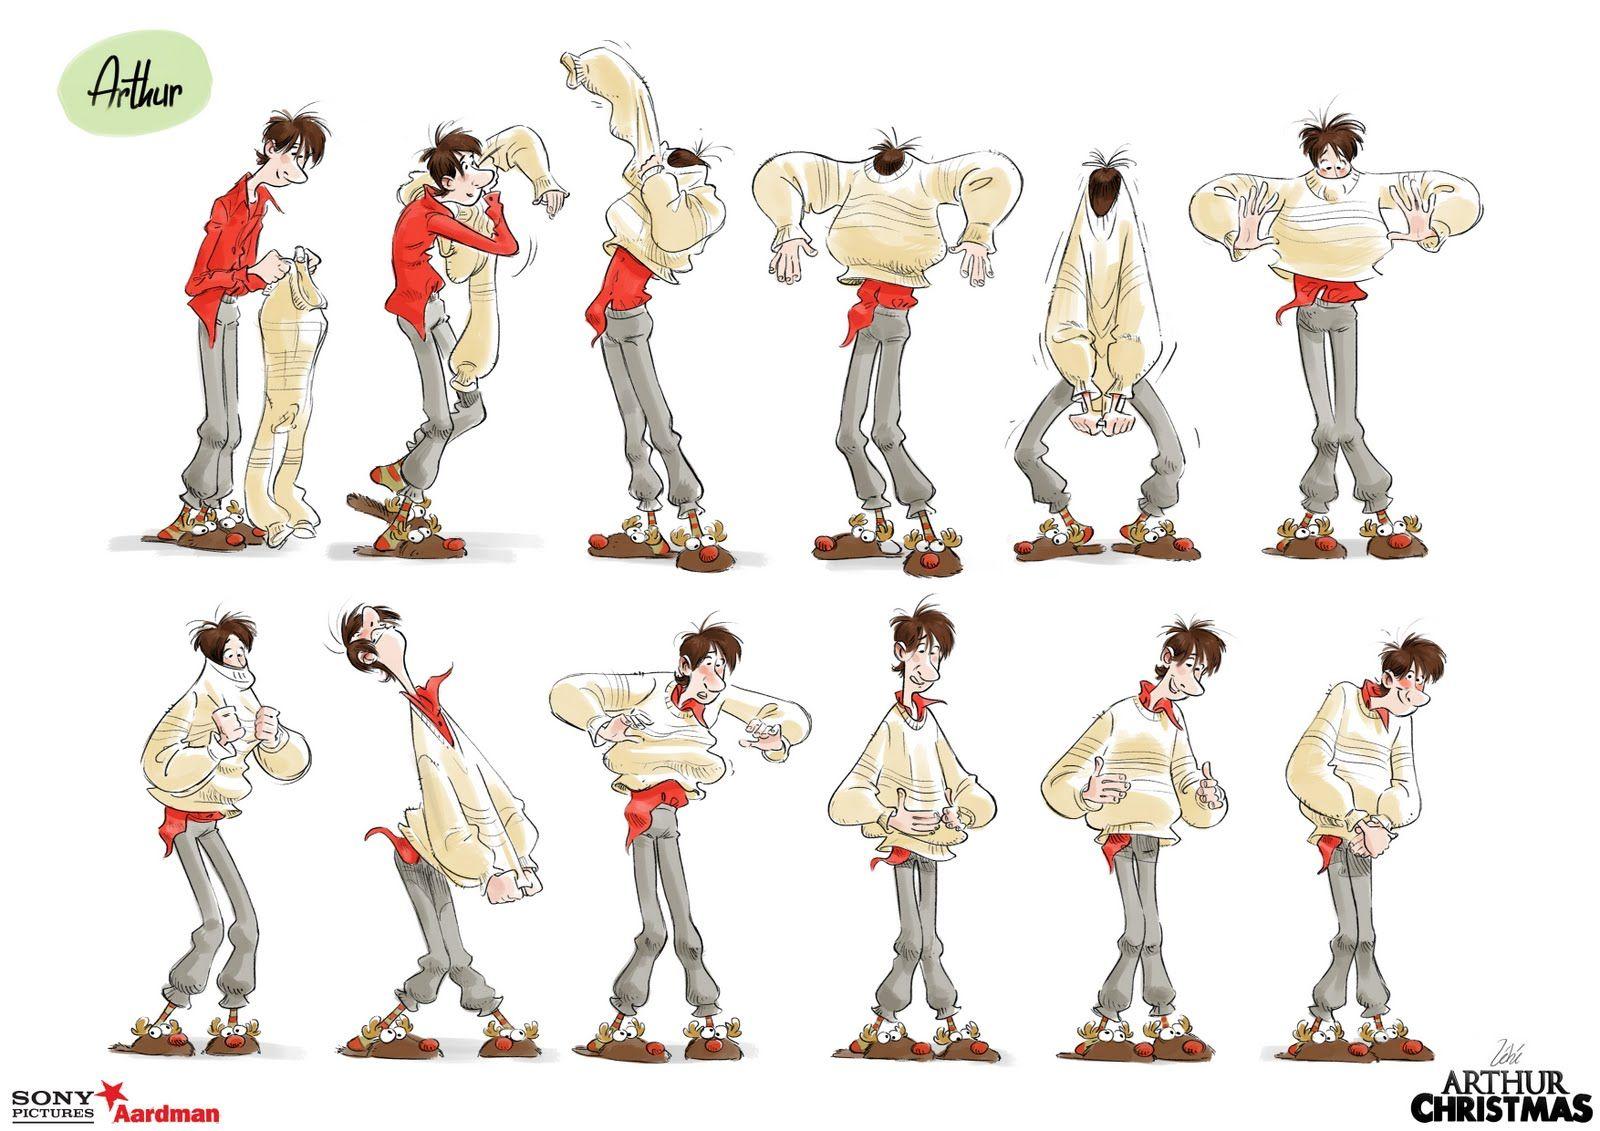 ARTHUR-JUMPER. ✤ || CHARACTER DESIGN REFERENCES | キャラクターデザイン | çizgi film • Find more at https://www.facebook.com/CharacterDesignReferences & http://www.pinterest.com/characterdesigh if you're looking for: bandes dessinées, dessin animé #animation #banda #desenhada #toons #manga #BD #historieta #sketch #how #to #draw #strip #fumetto #settei #fumetti #manhwa #cartoni #animati #comics #cartoon || ✤